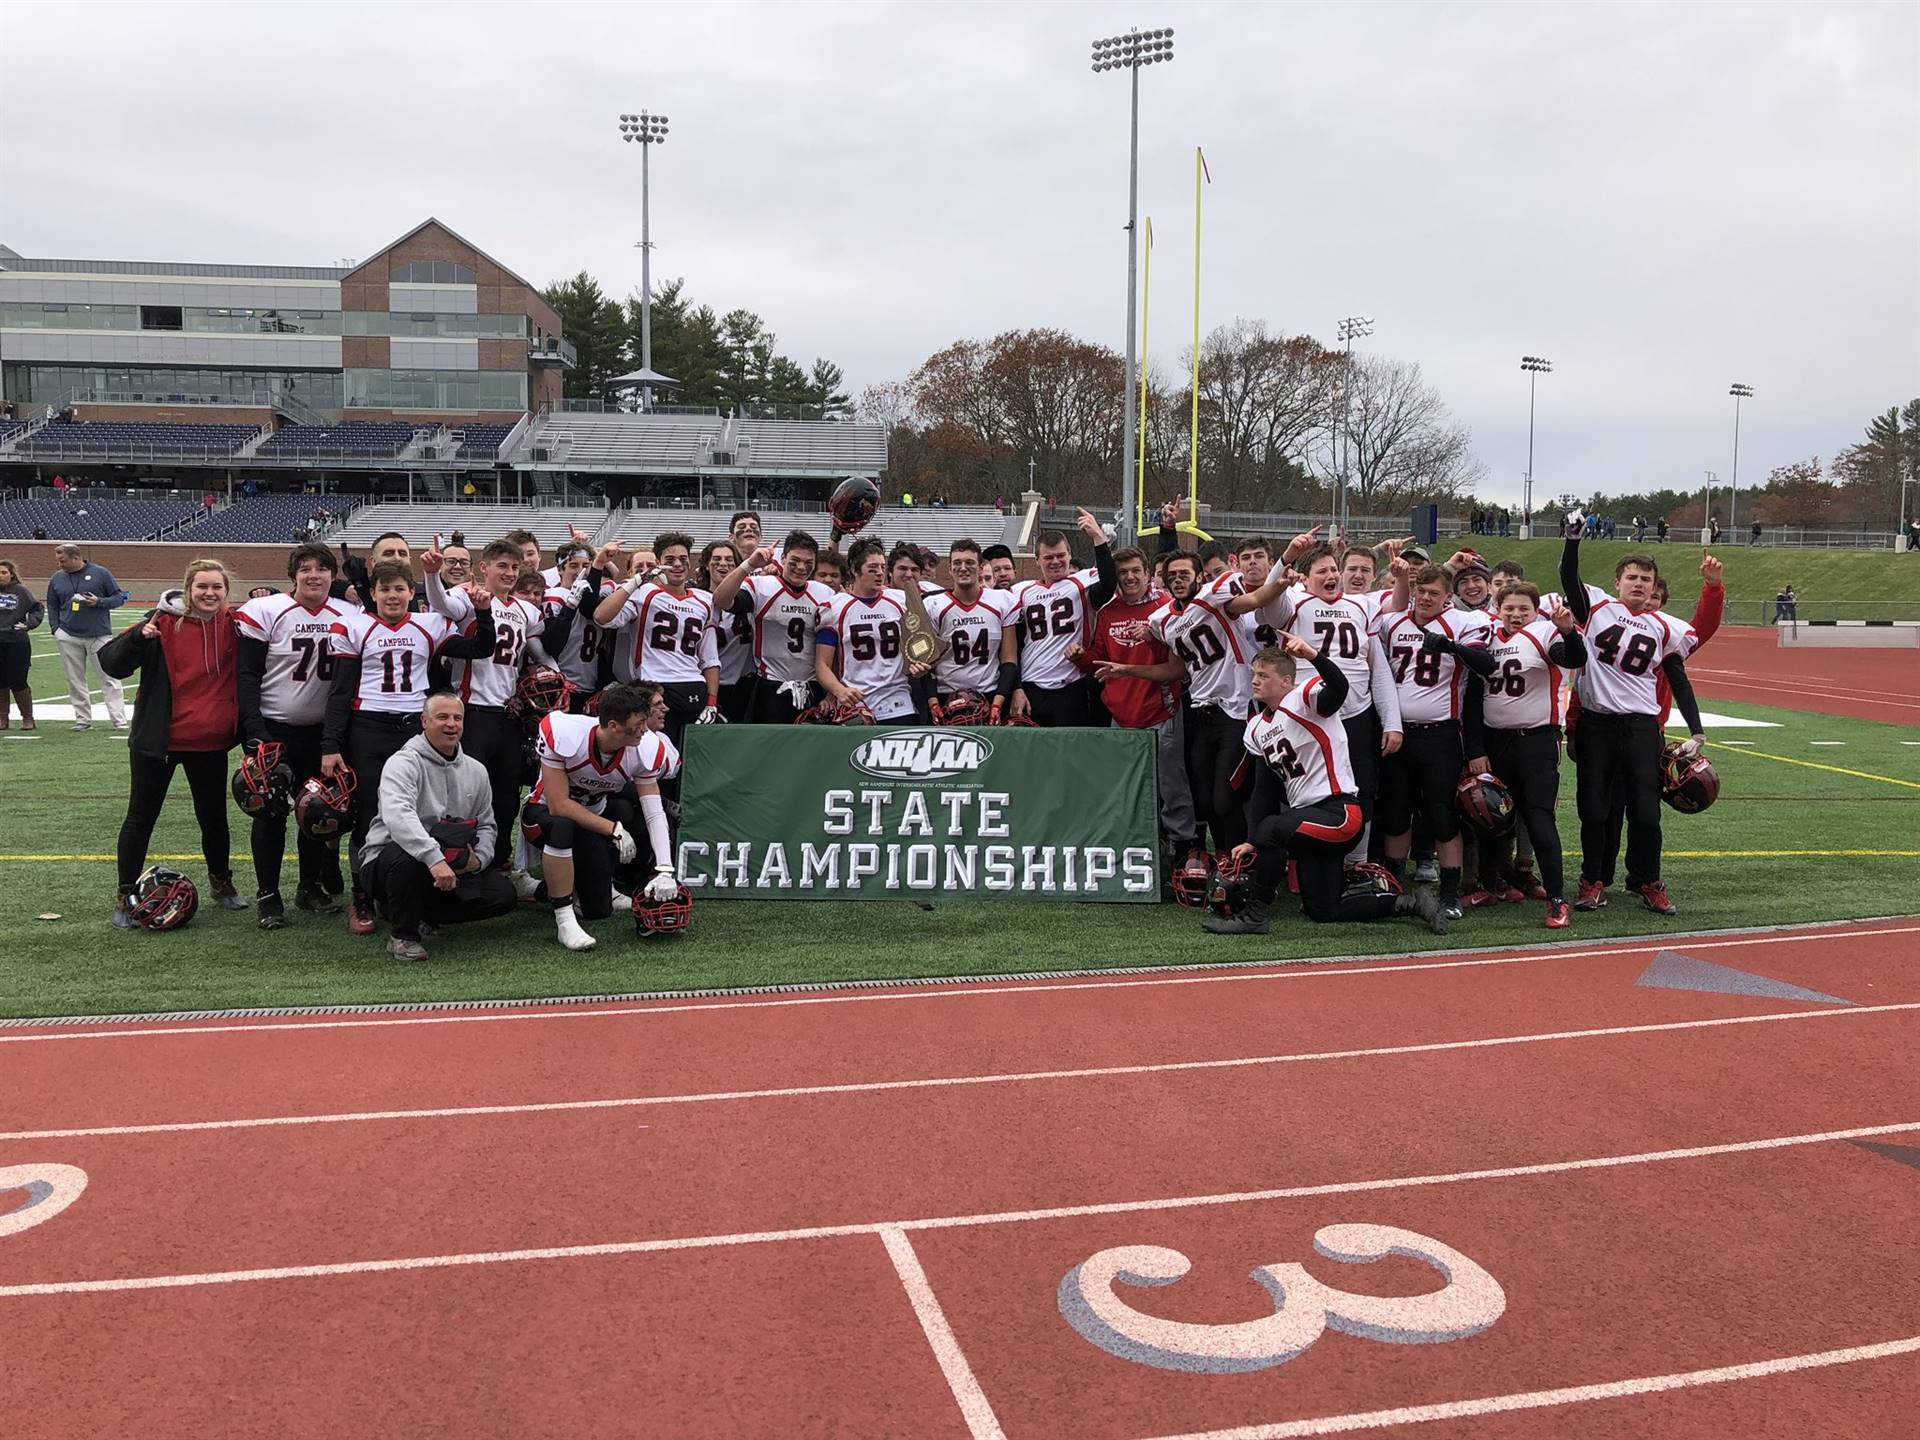 NHIAA D-III Champions 2017